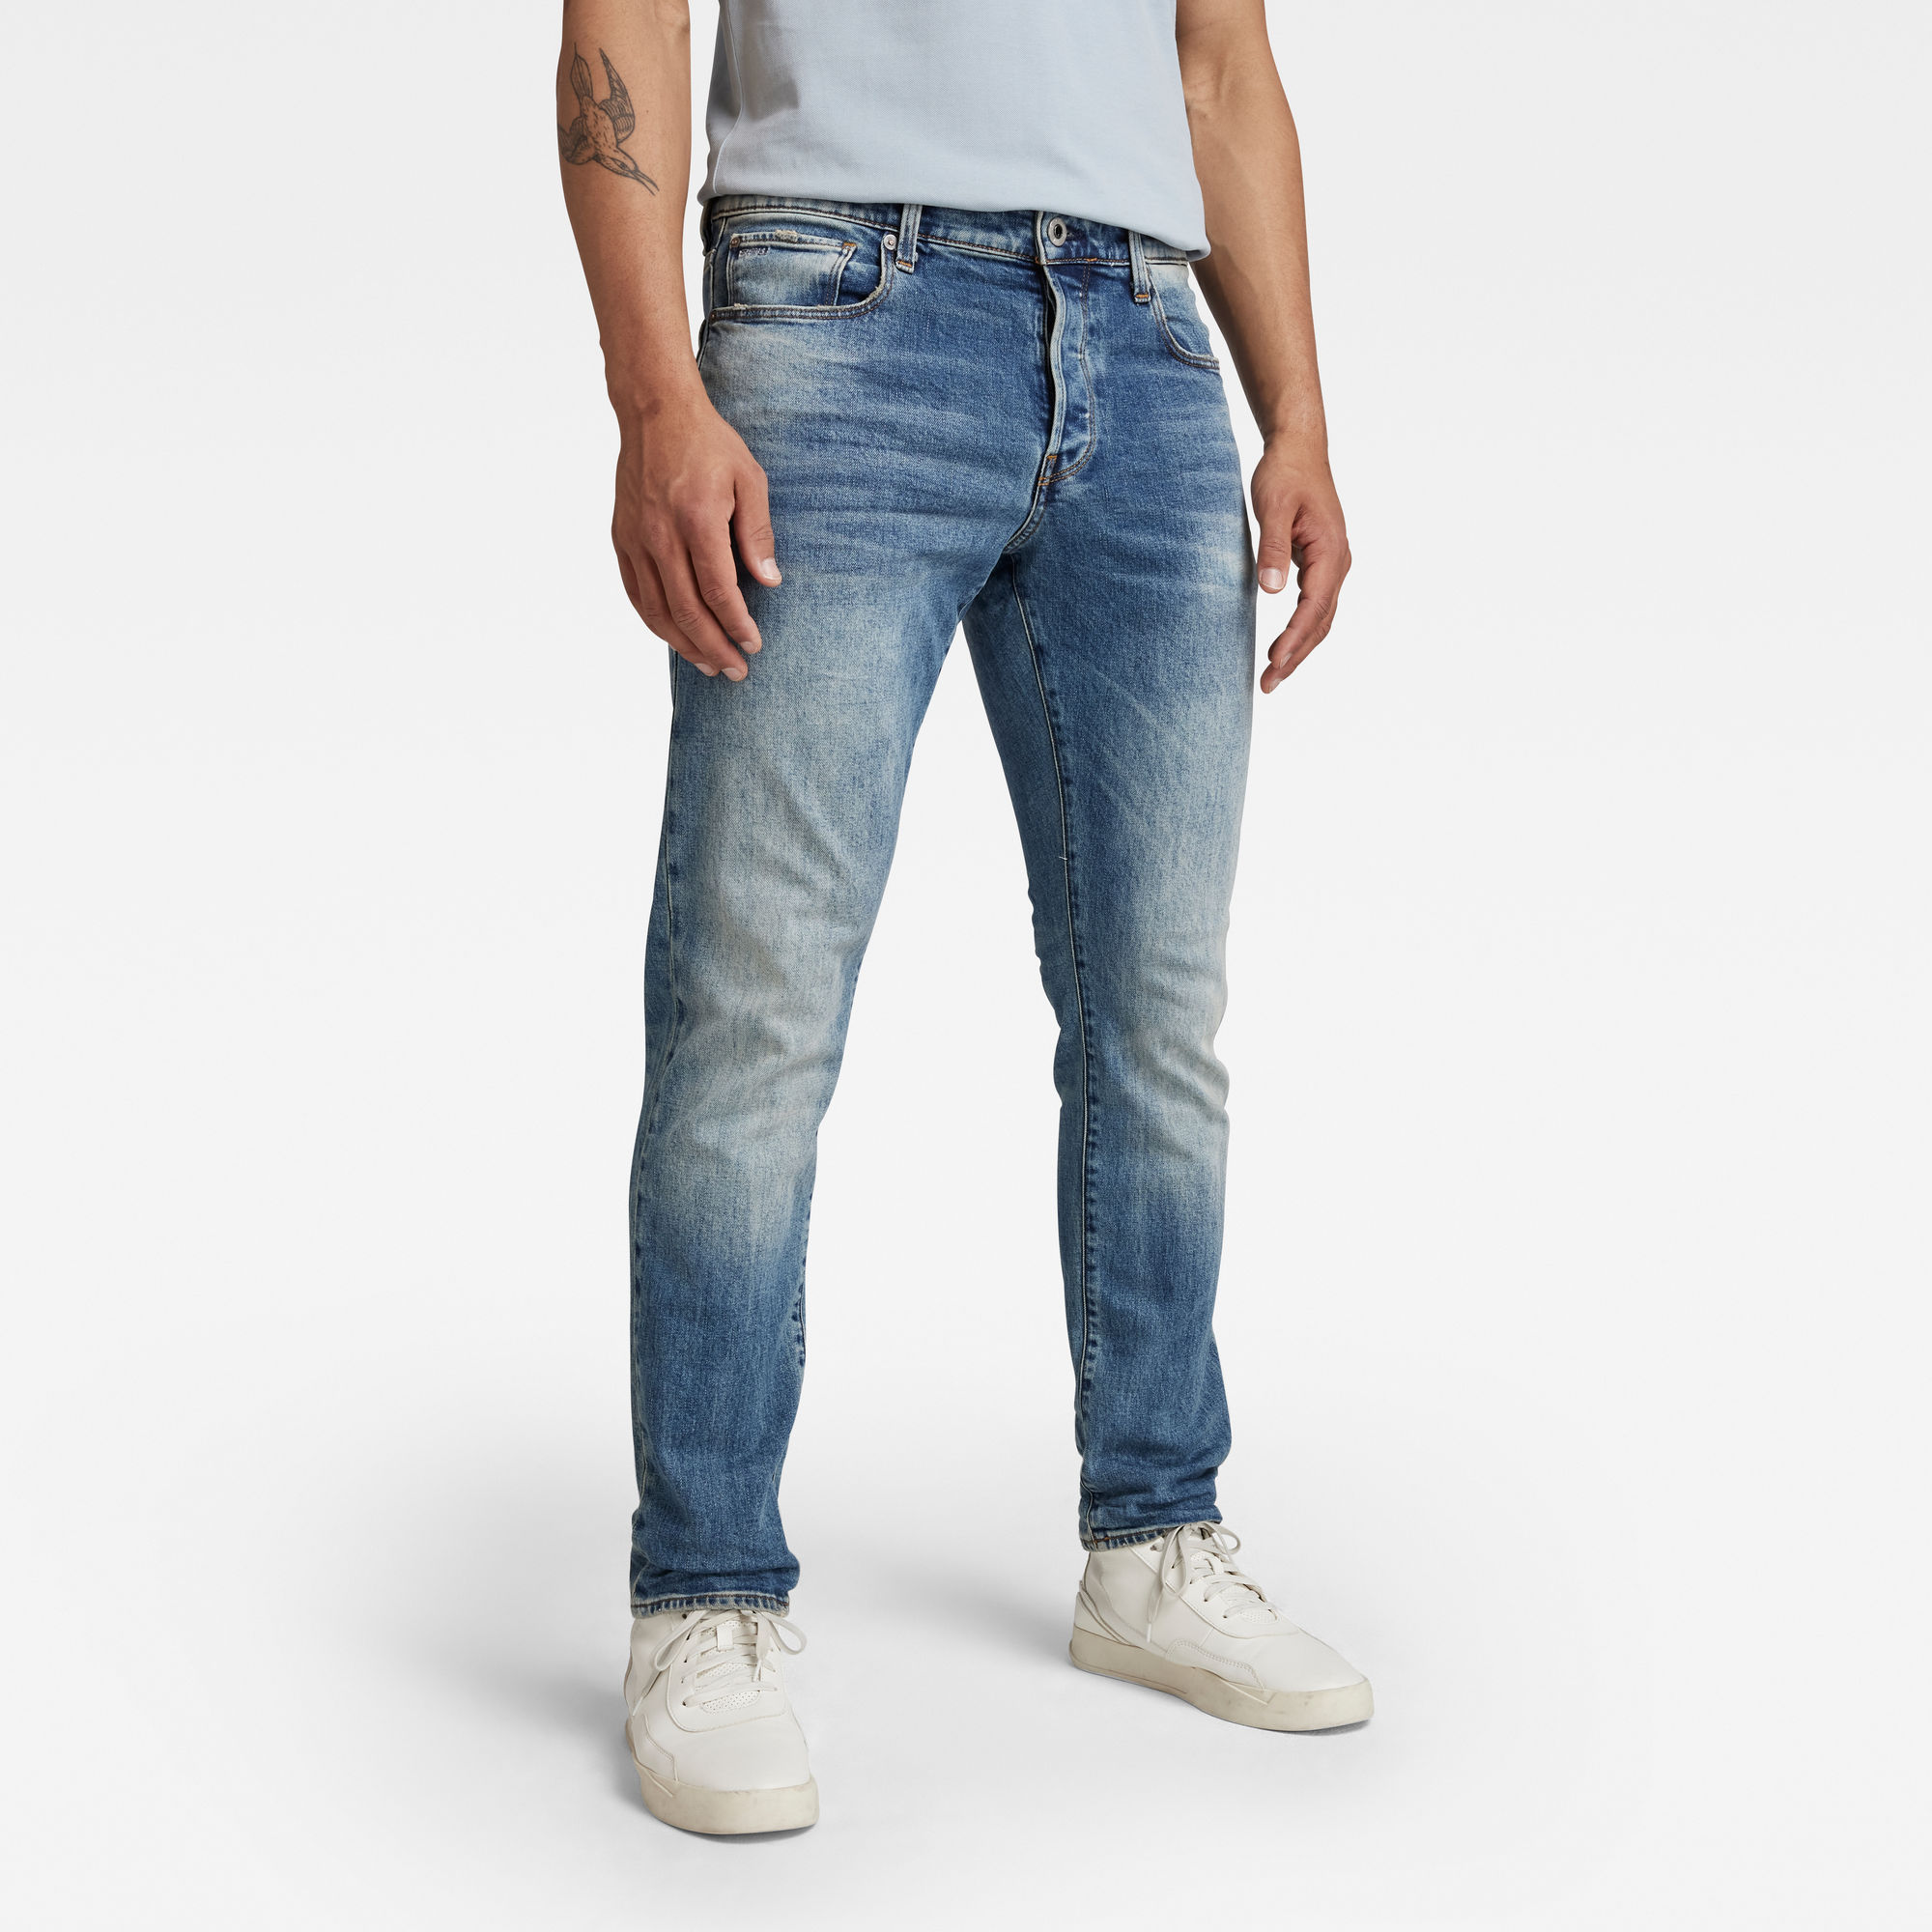 G Star RAW Heren 3301 Straight Tapered Jeans Lichtblauw